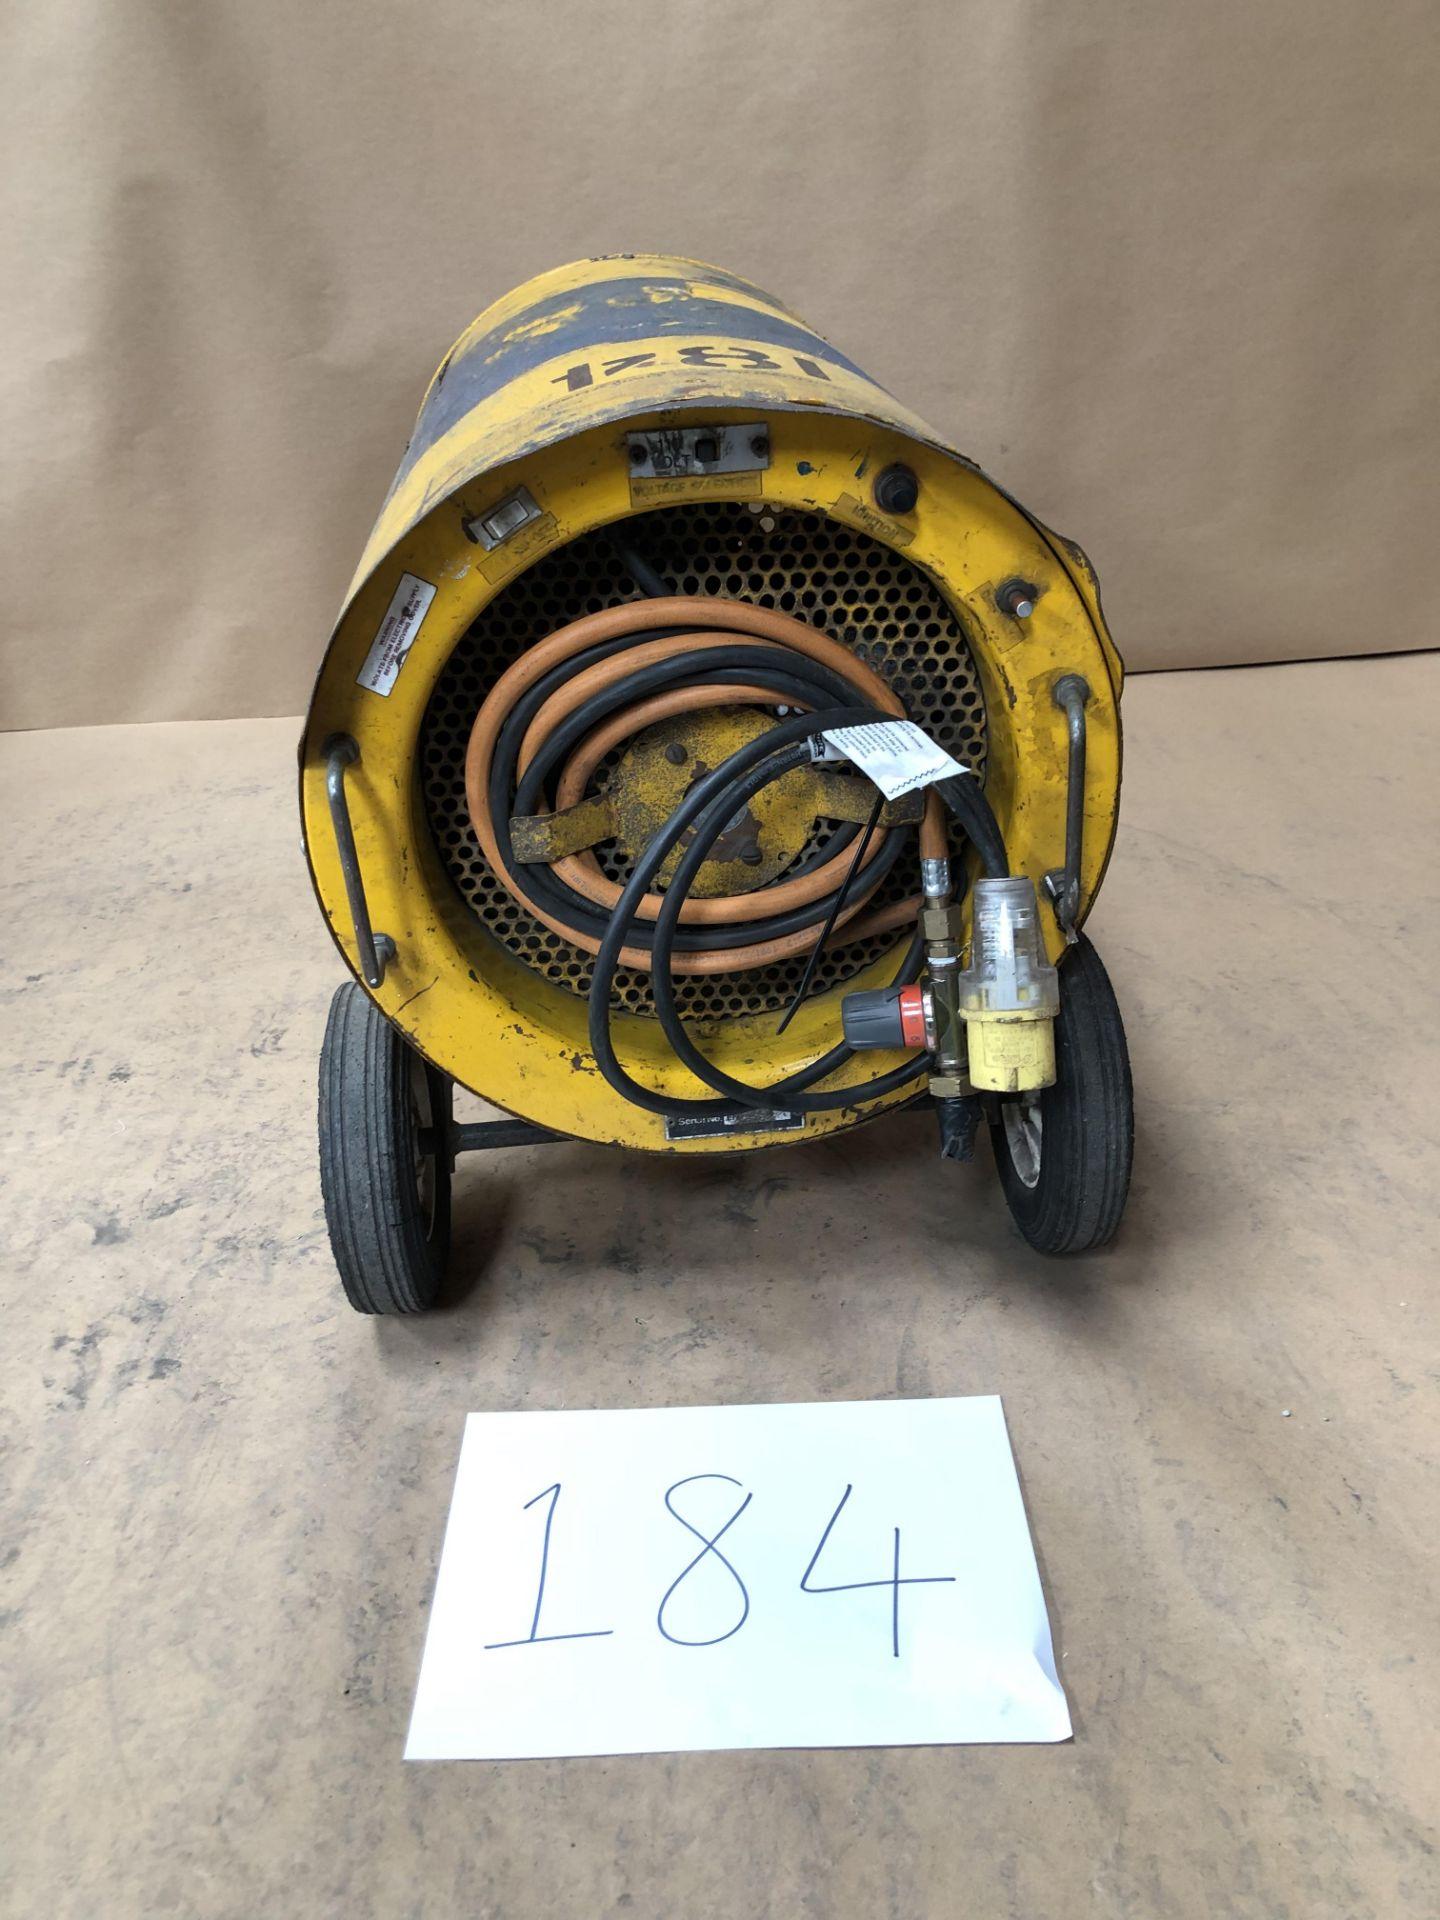 Easyheater 275 Propane Heater - Image 4 of 5